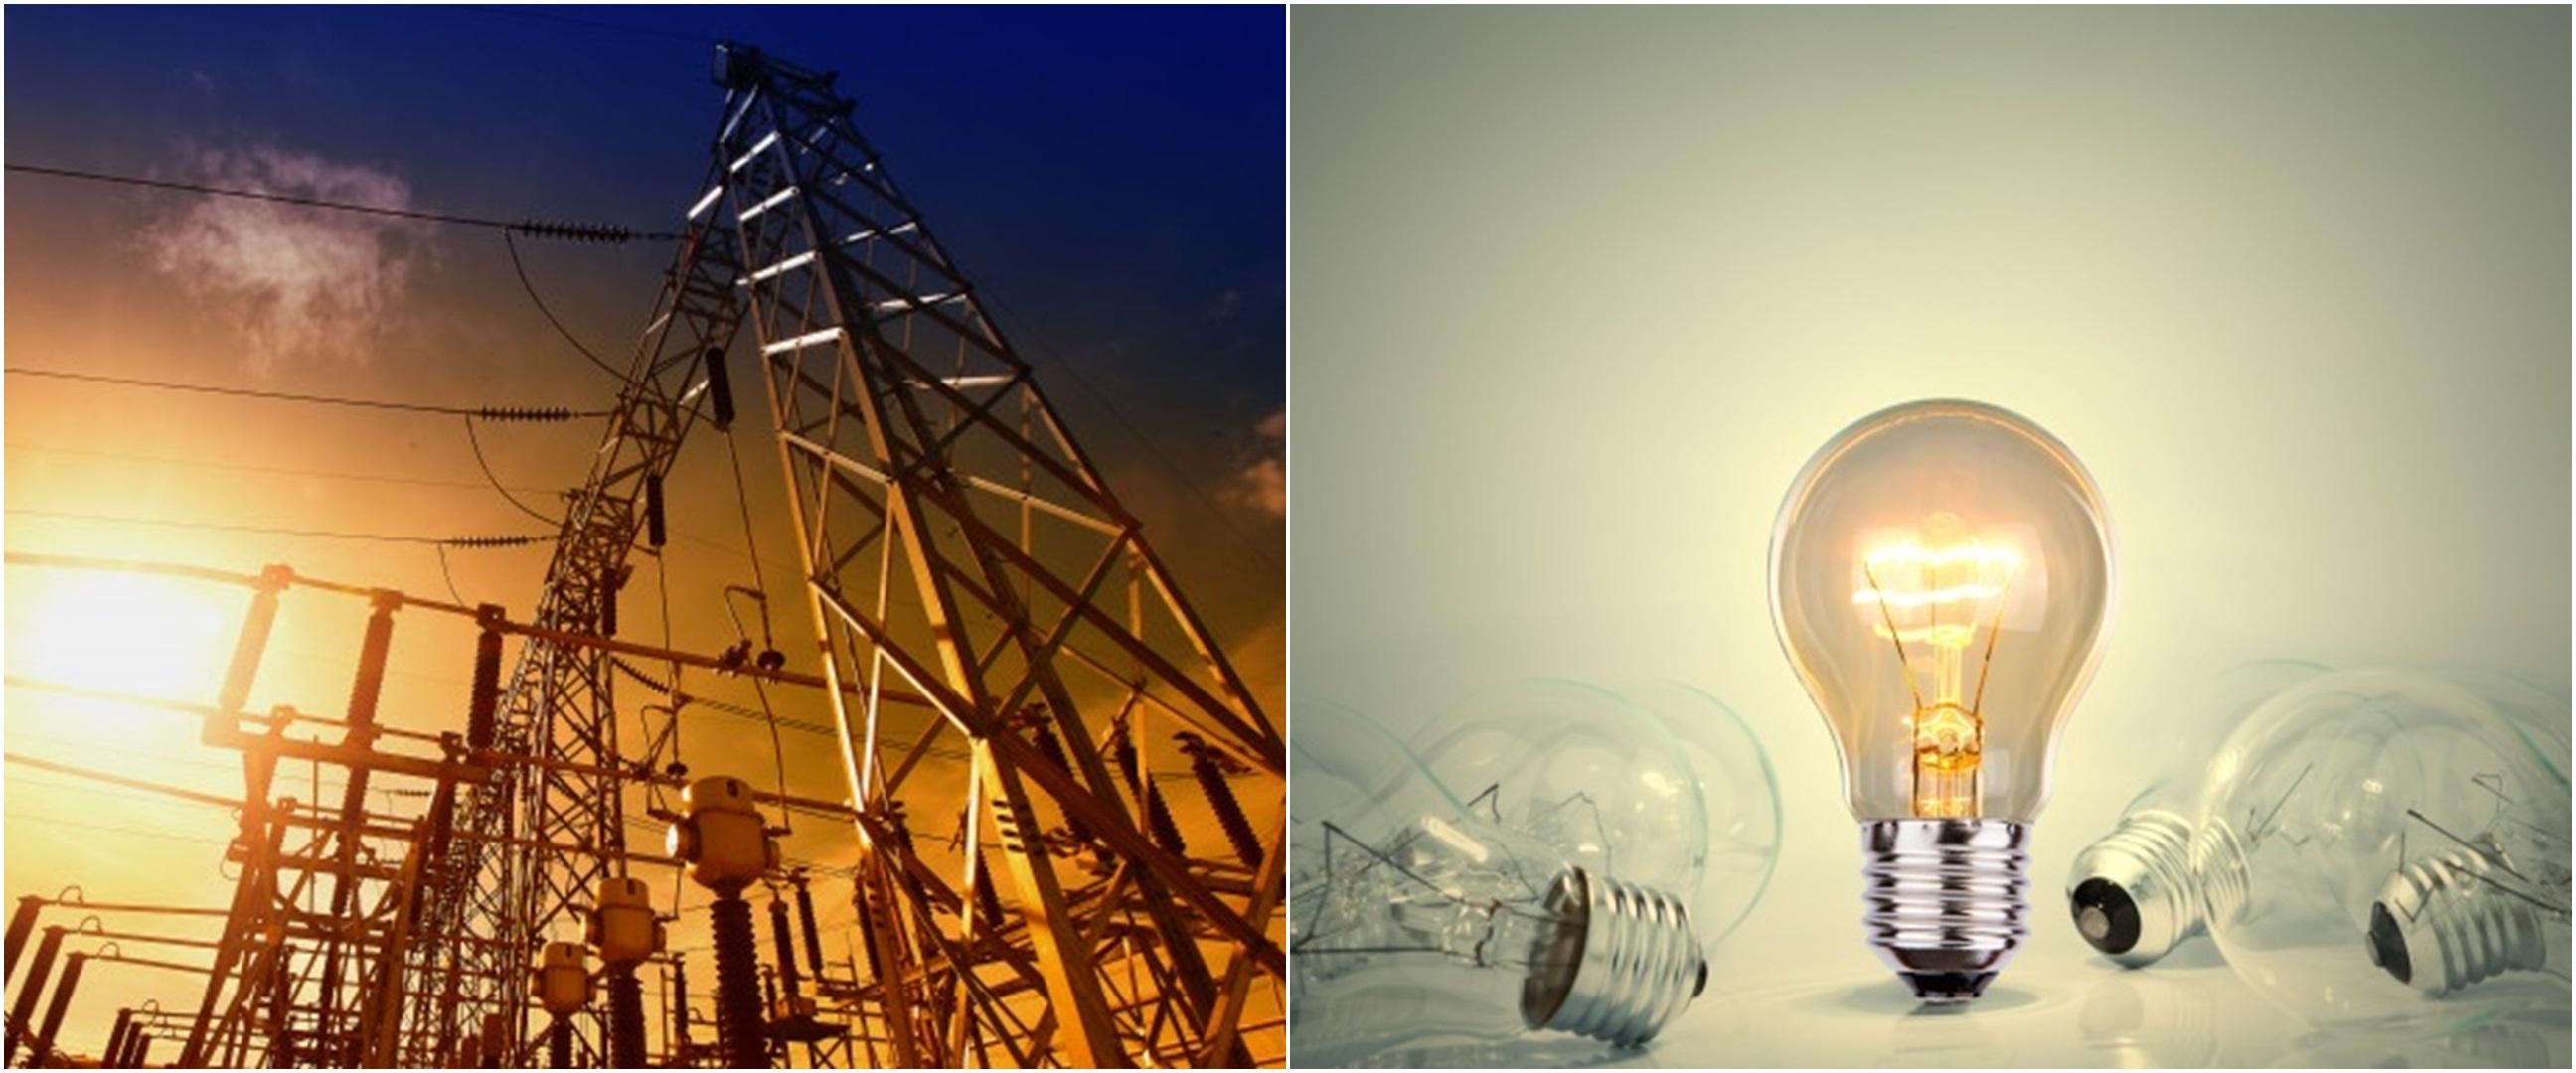 Cara klaim token subsidi listrik PLN bagi pelanggan 900 VA & 1300 VA